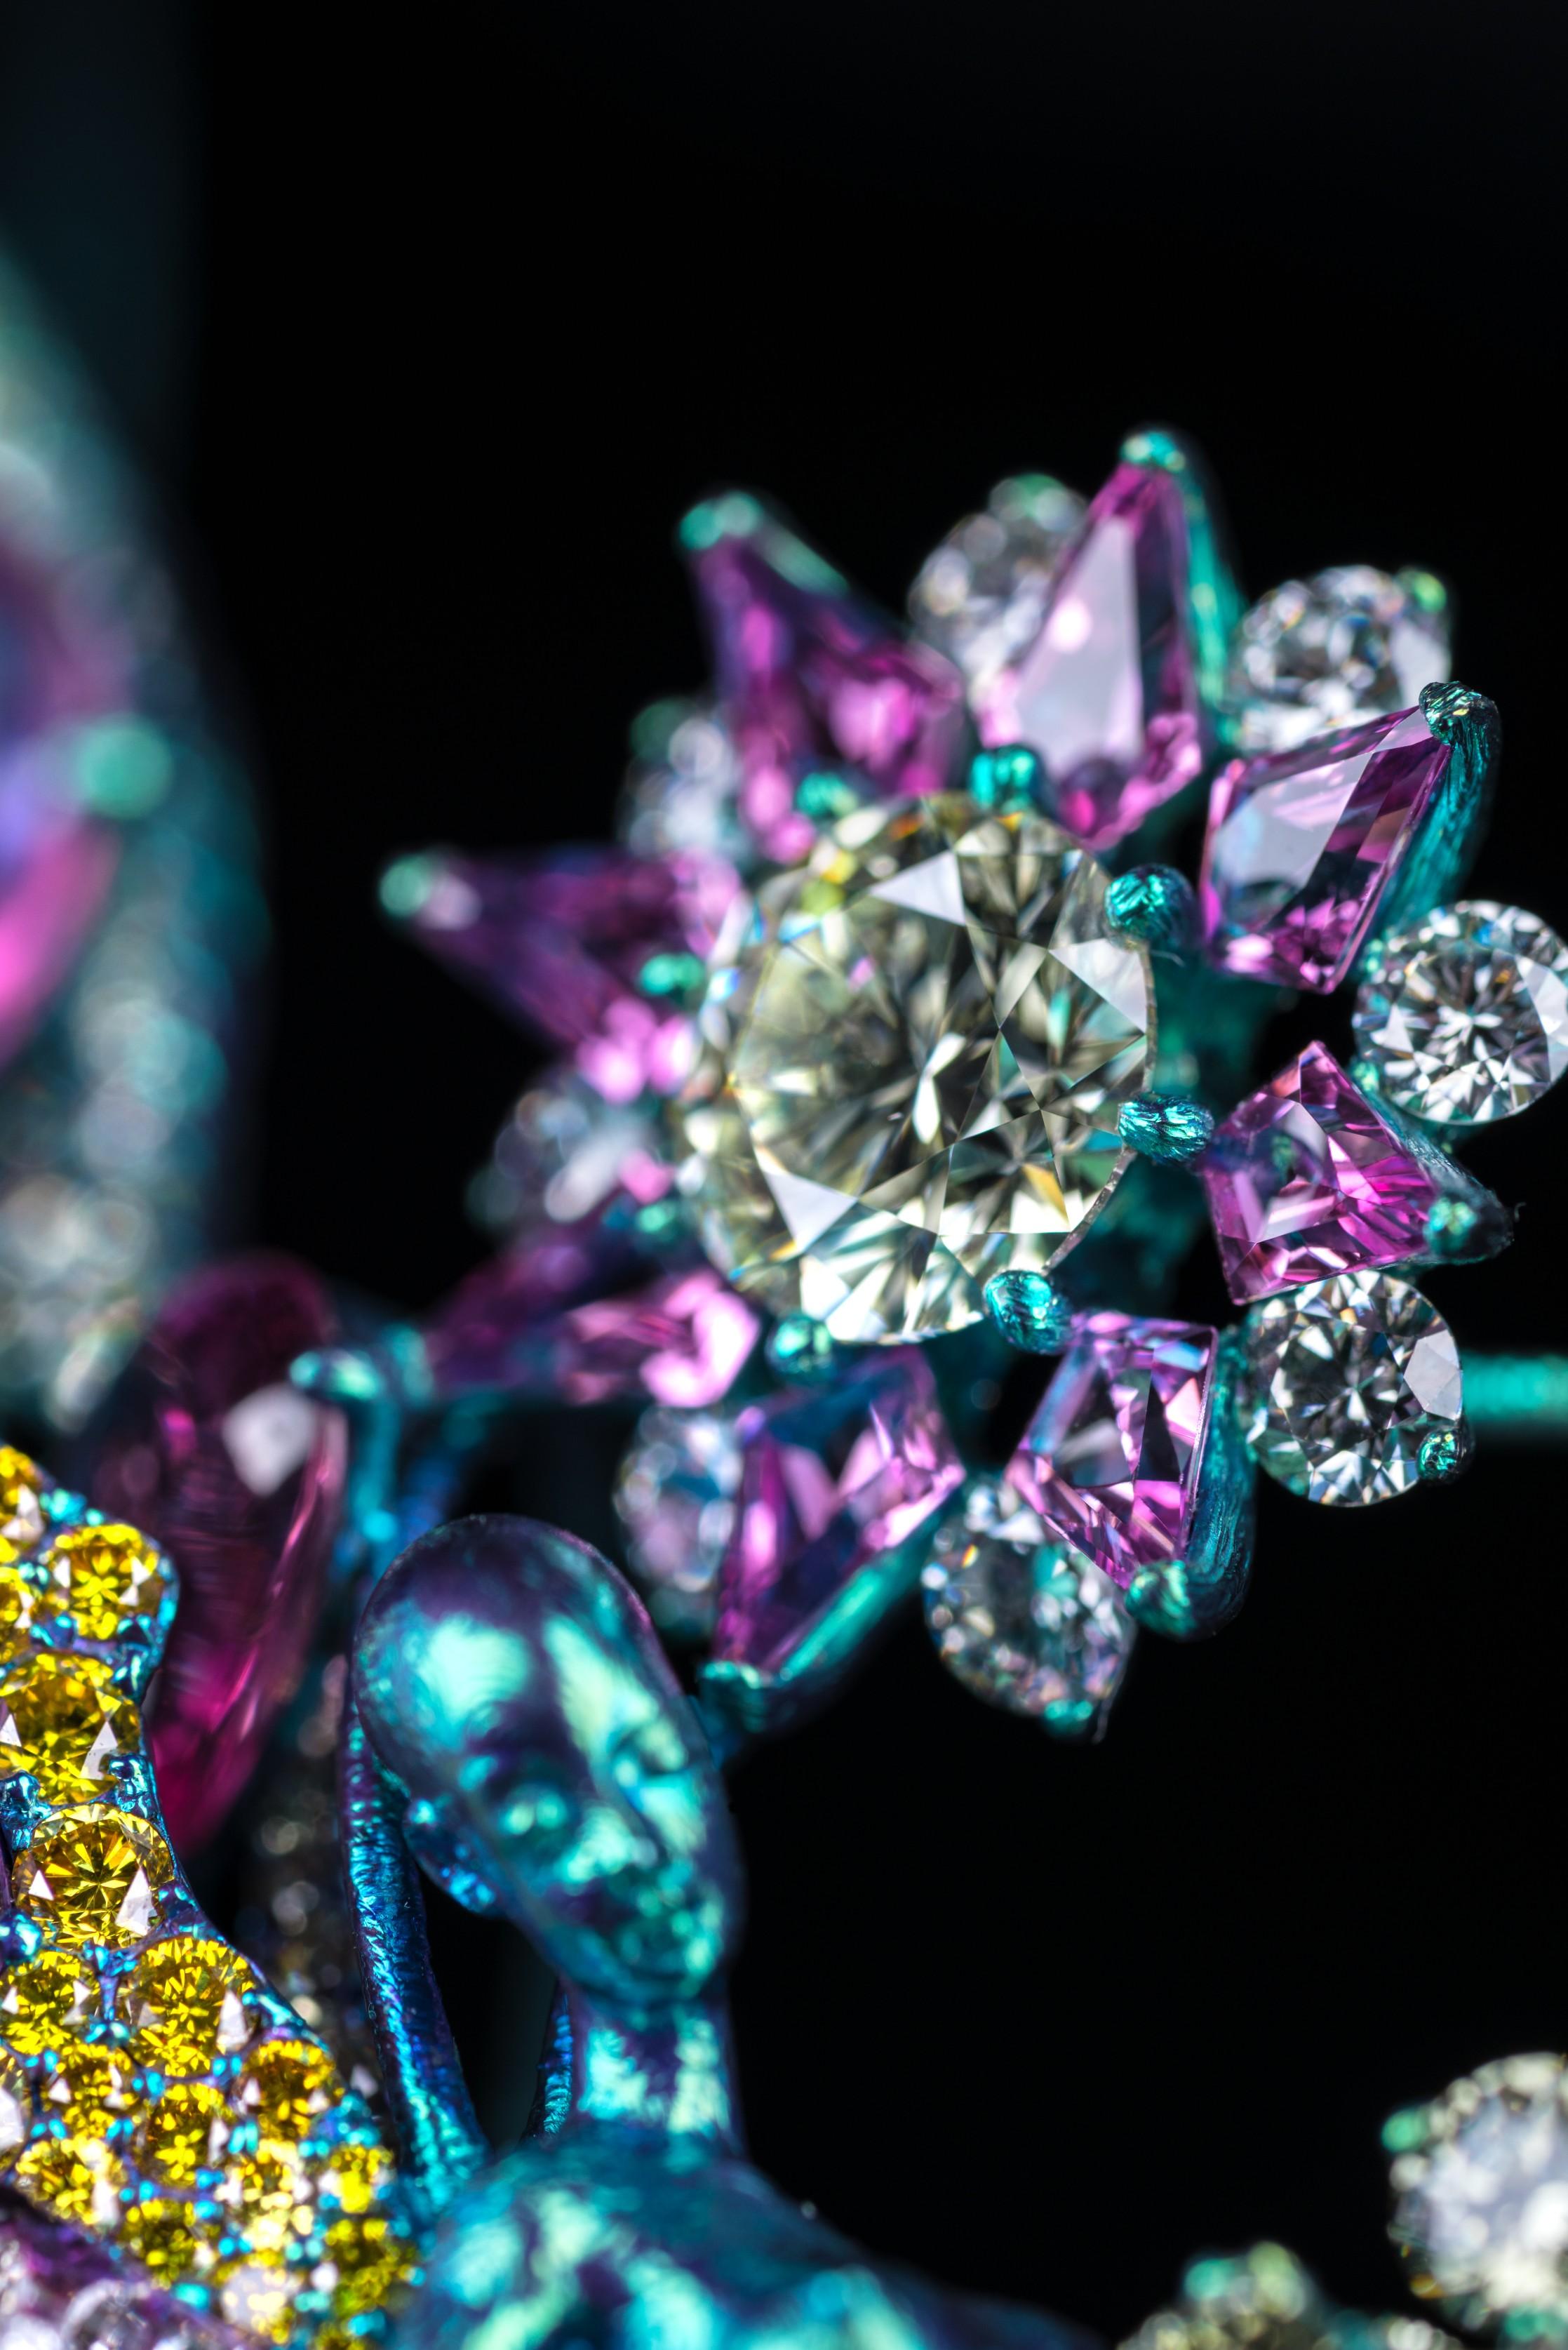 Brooch_Butterfly Nebula ╜╣╜║¼P╢│ 6.jpg